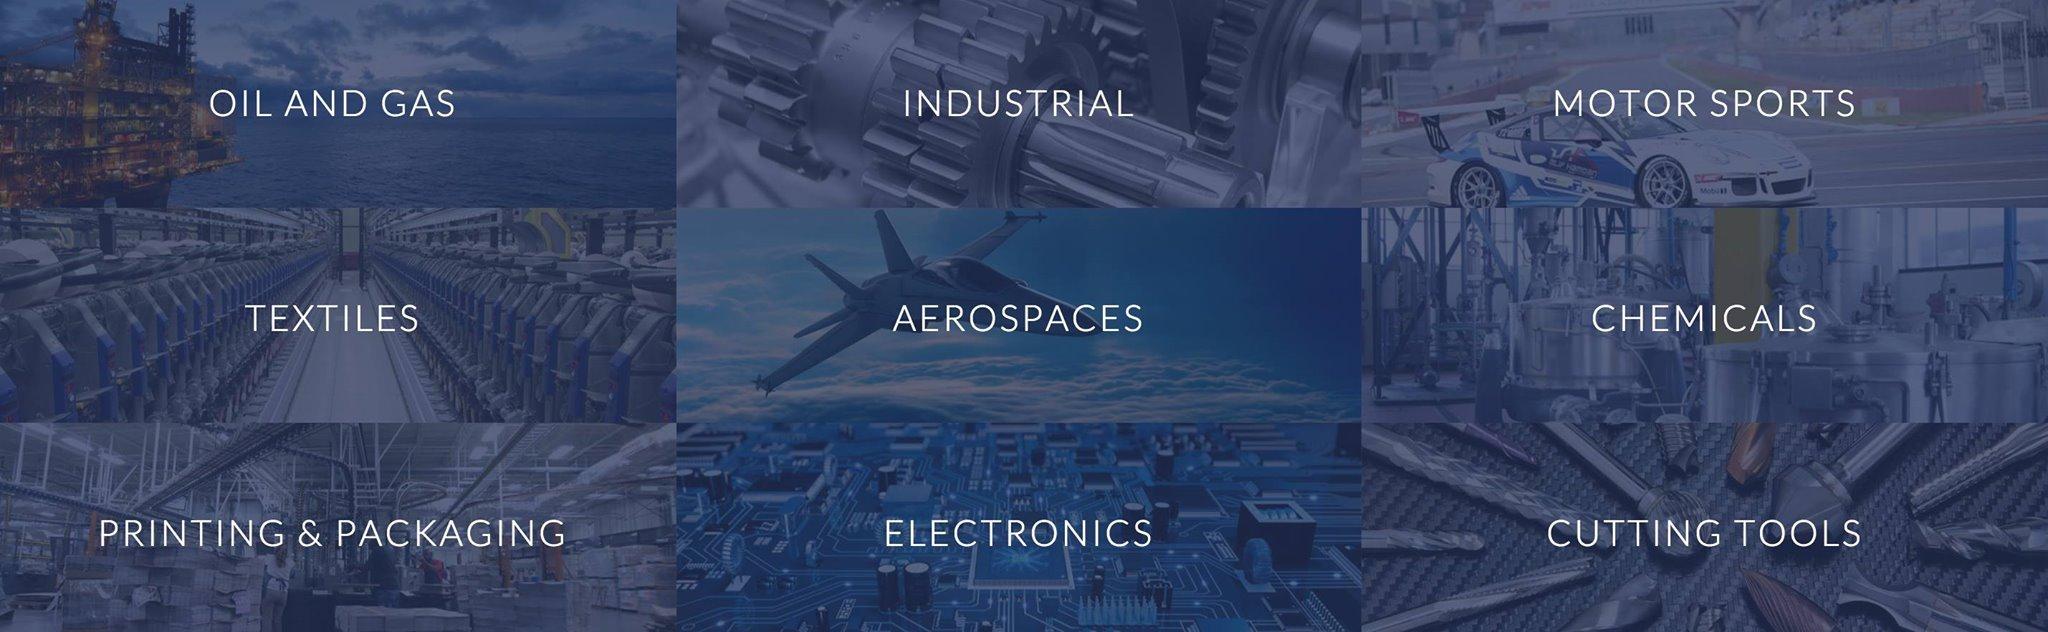 industrial-hard-carbon-applications-dlc-coating.jpg